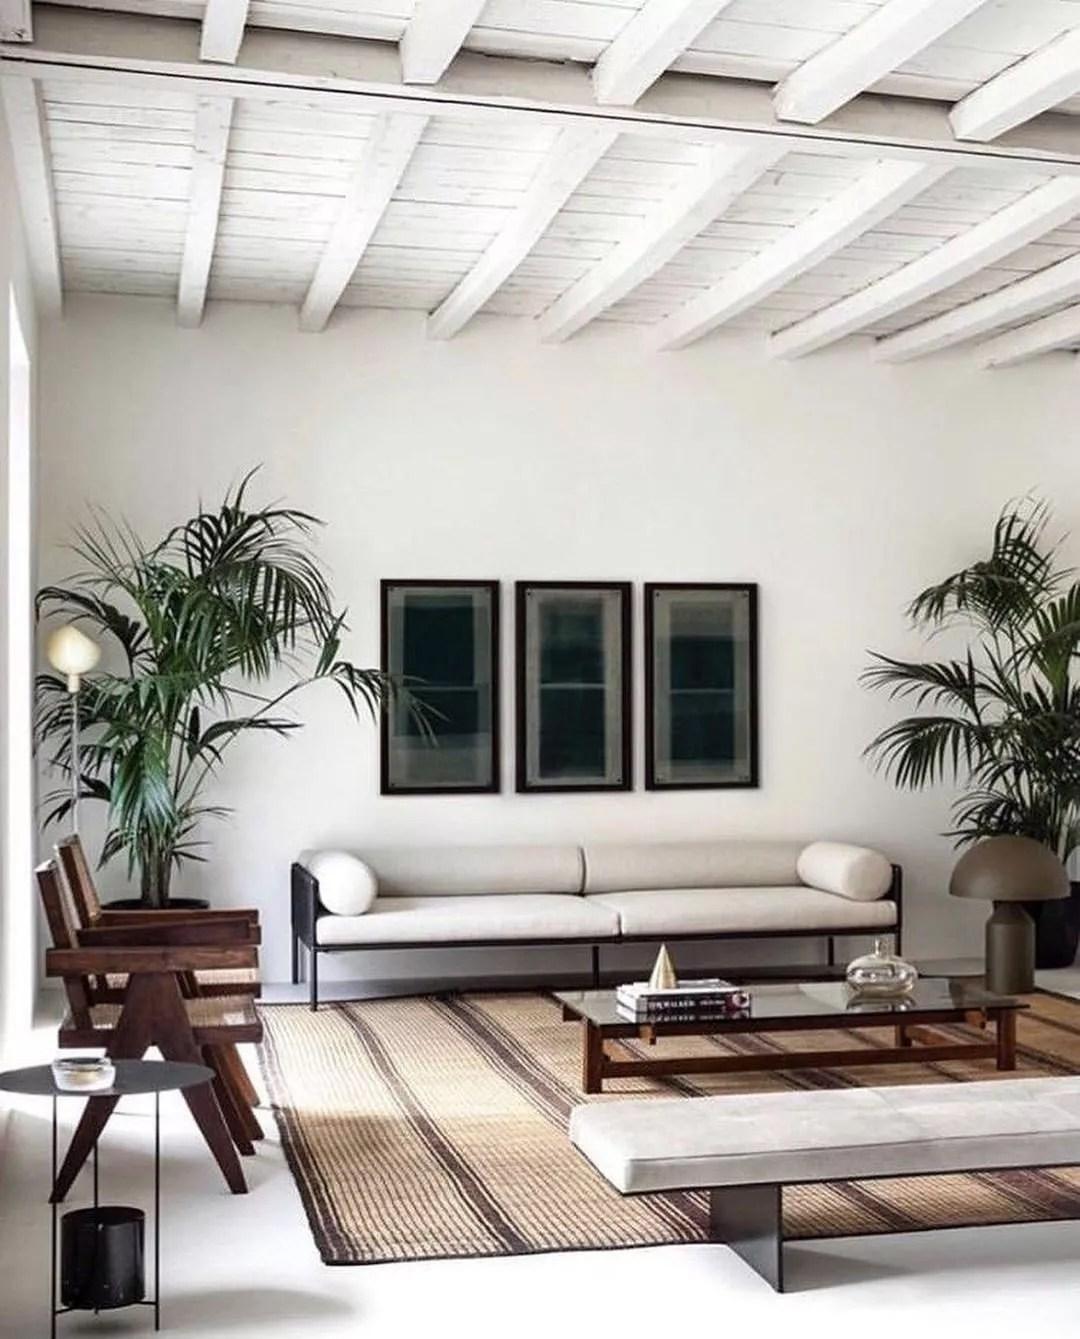 Japandi designed living room with white walls and dark wood furniture. Photo by Instagram user @srelle_studio